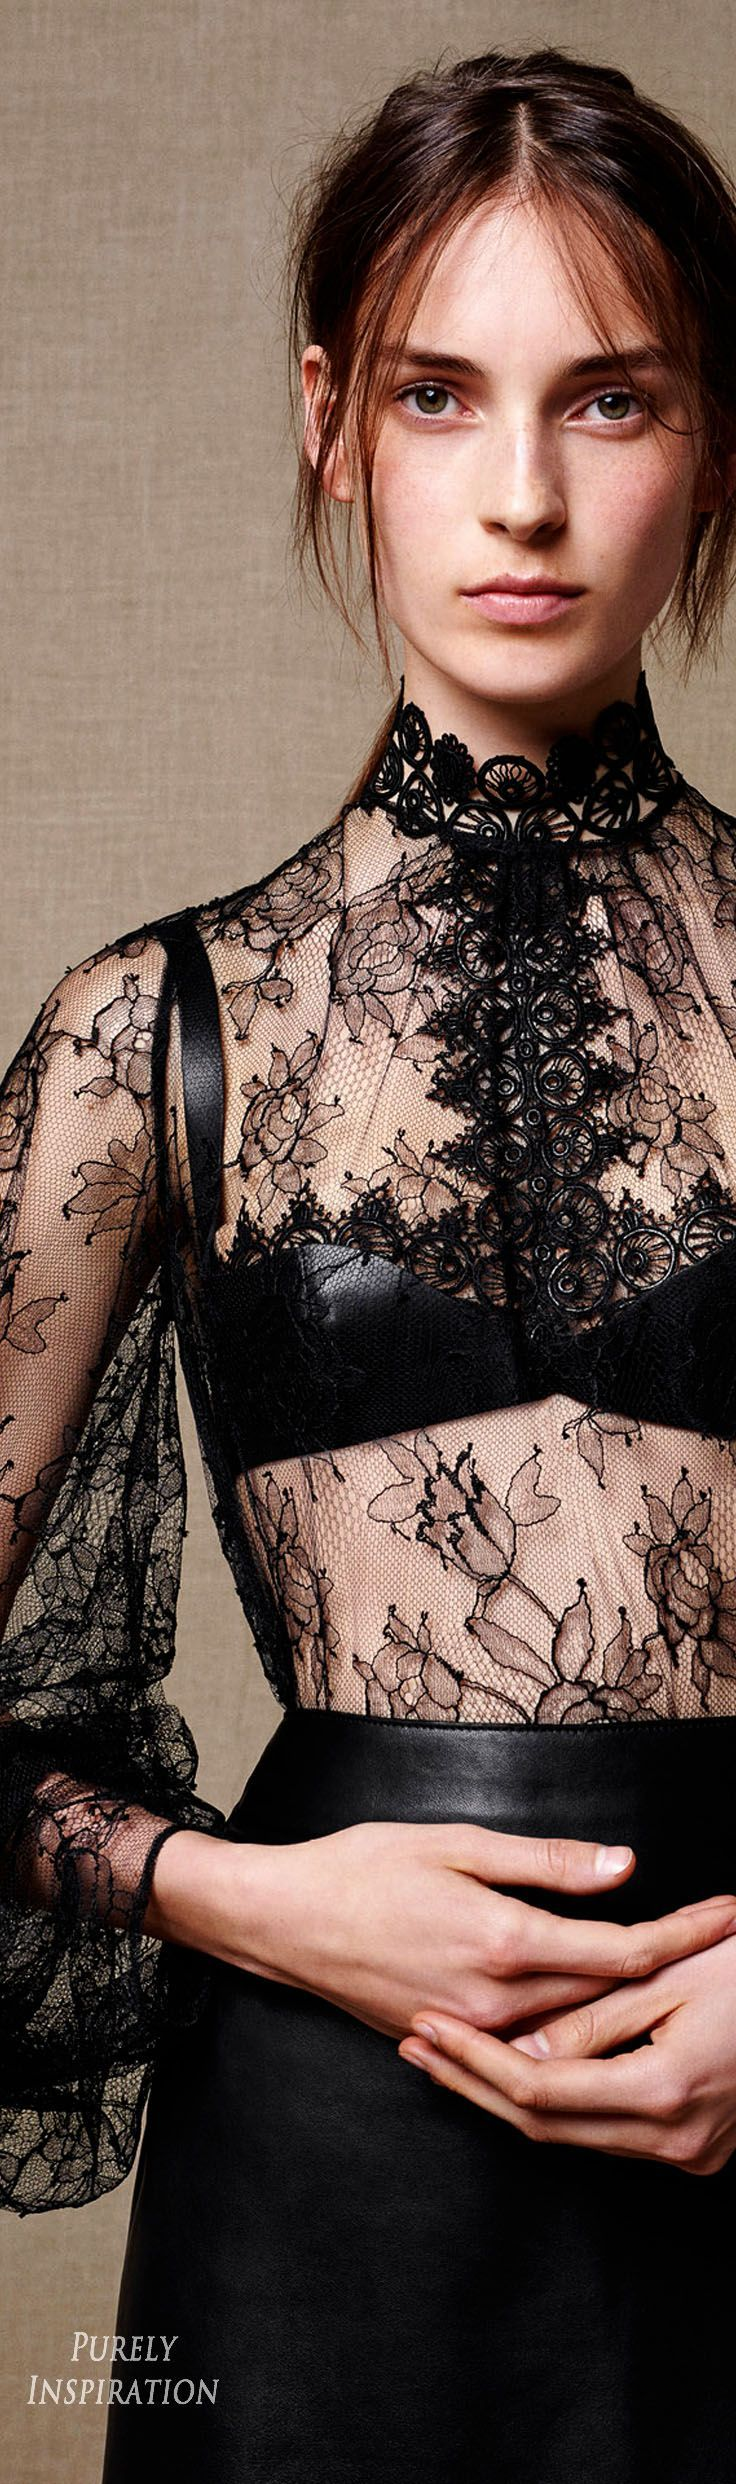 Alexander McQueen FW2015 Women's #Fashion RTW | Purely Inspiration